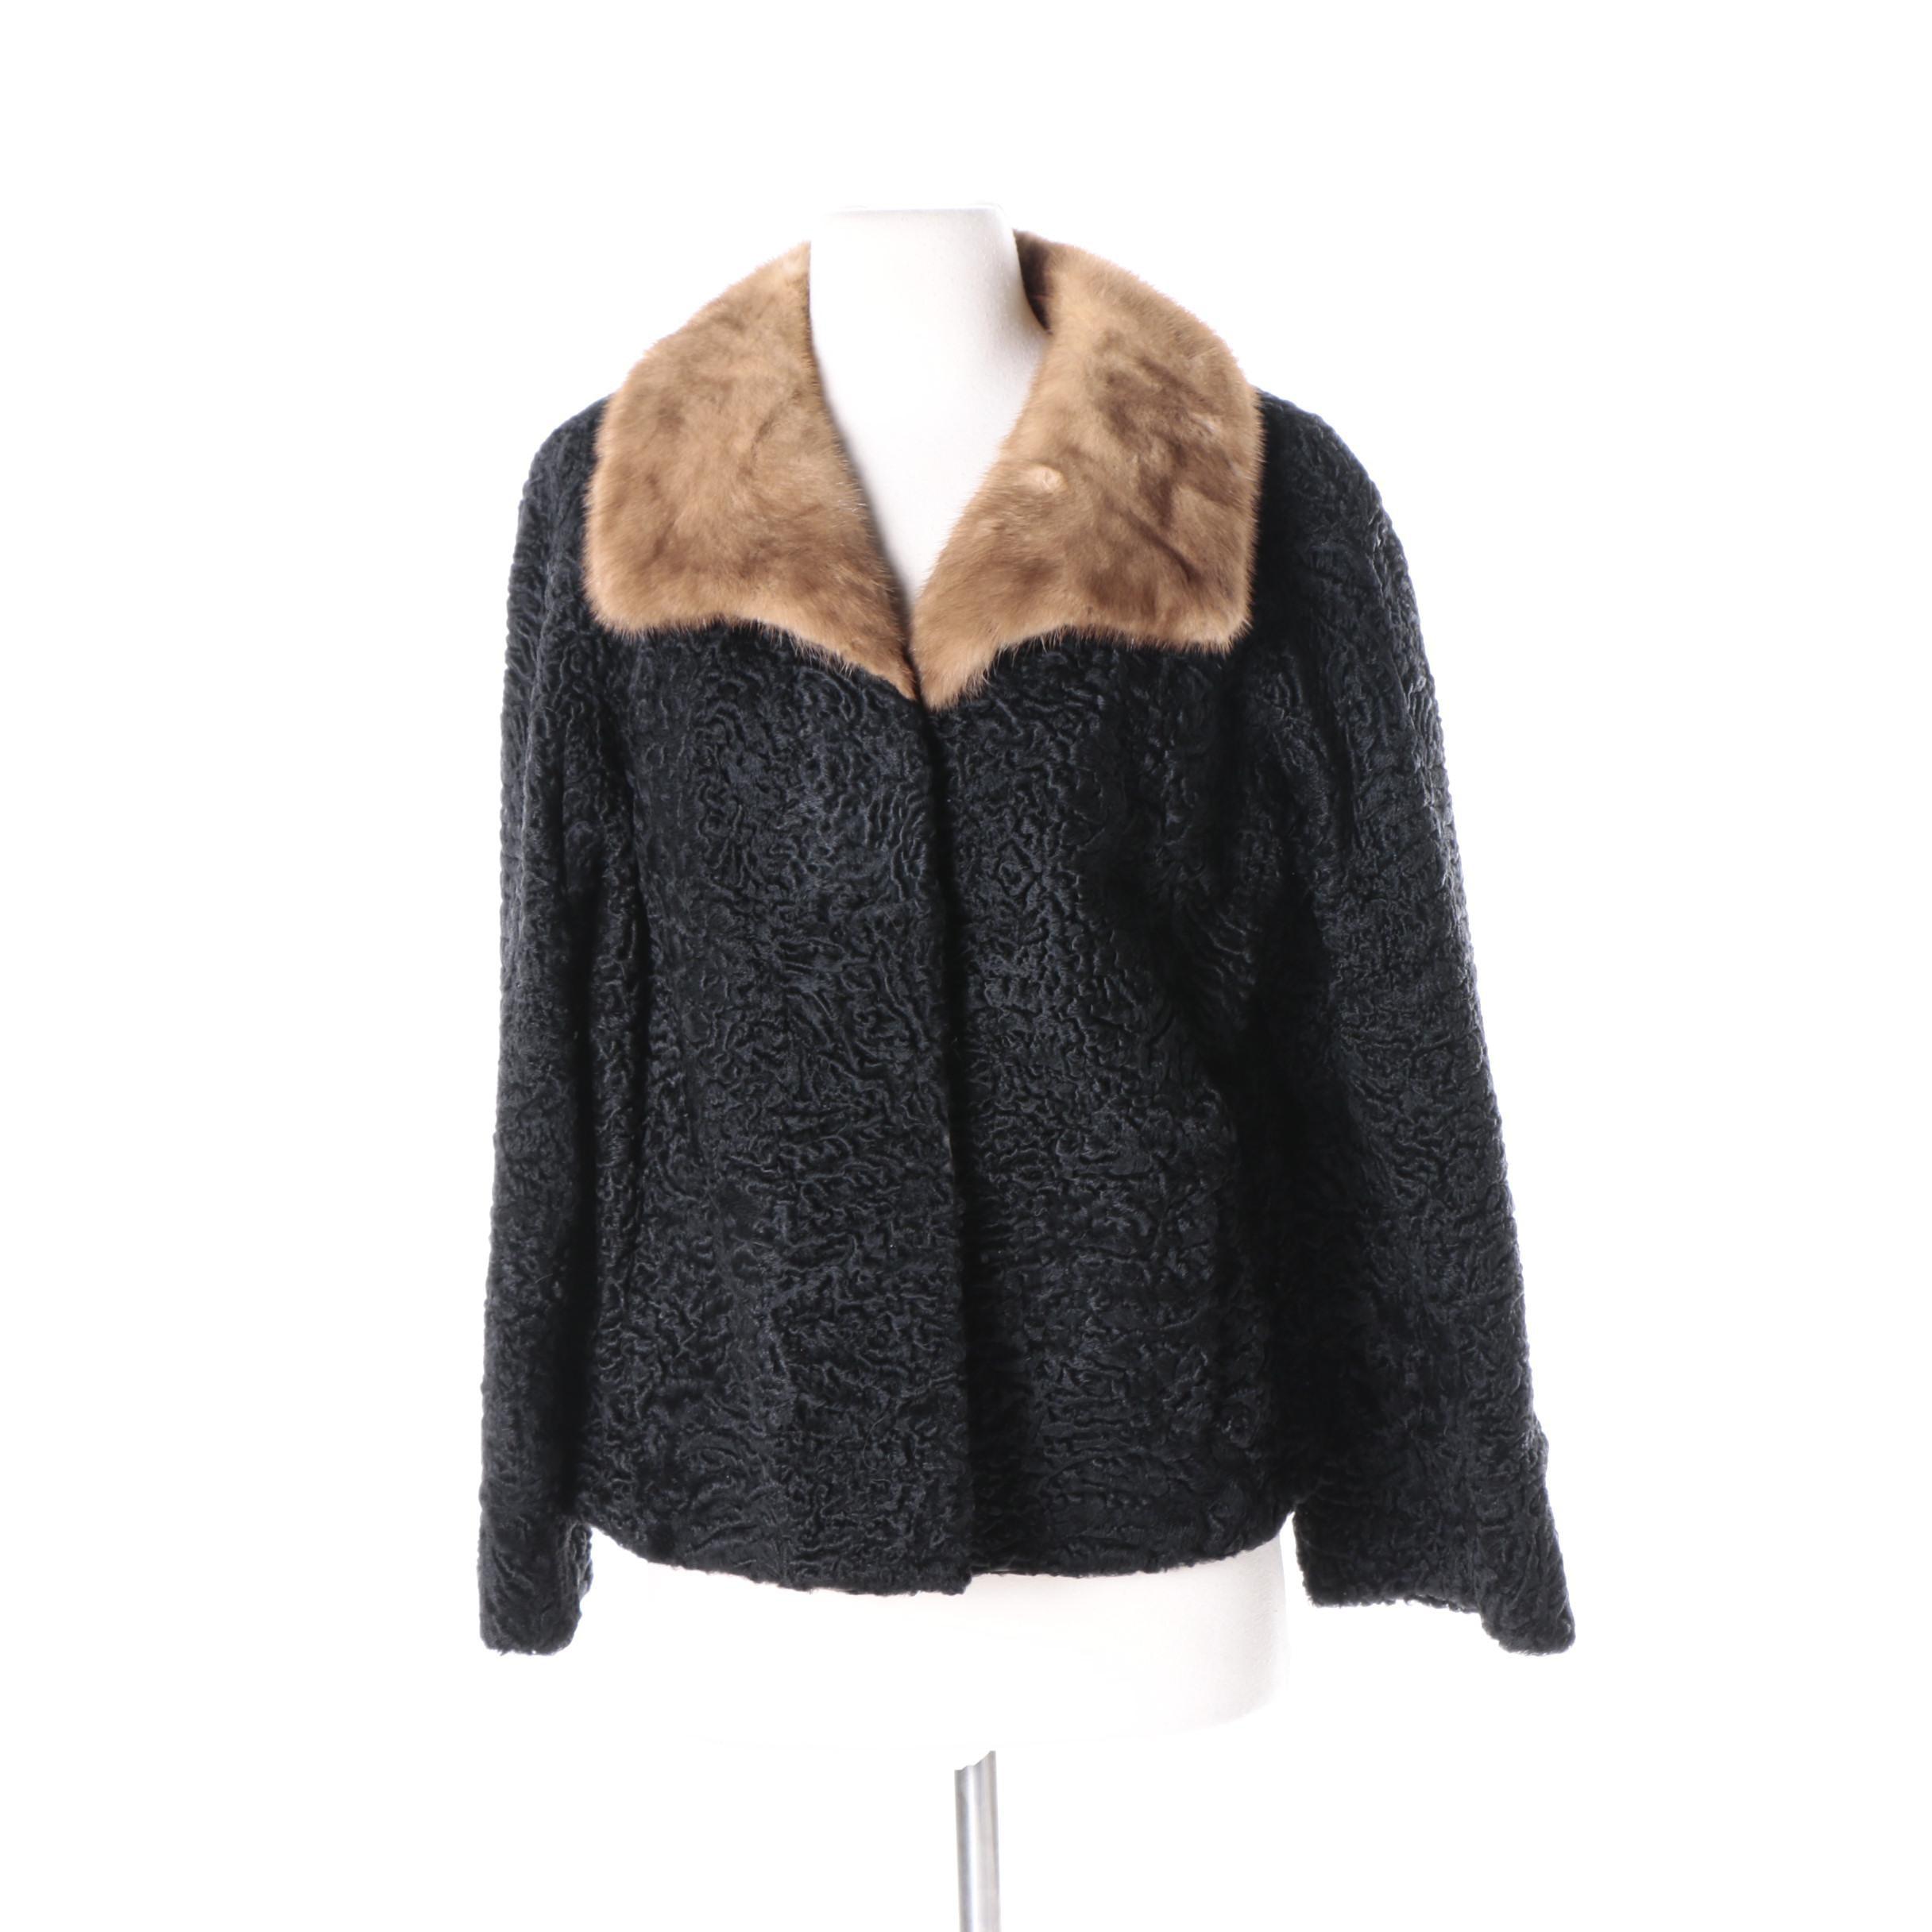 Women's Vintage Persian Lamb Coat with Mink Fur Collar